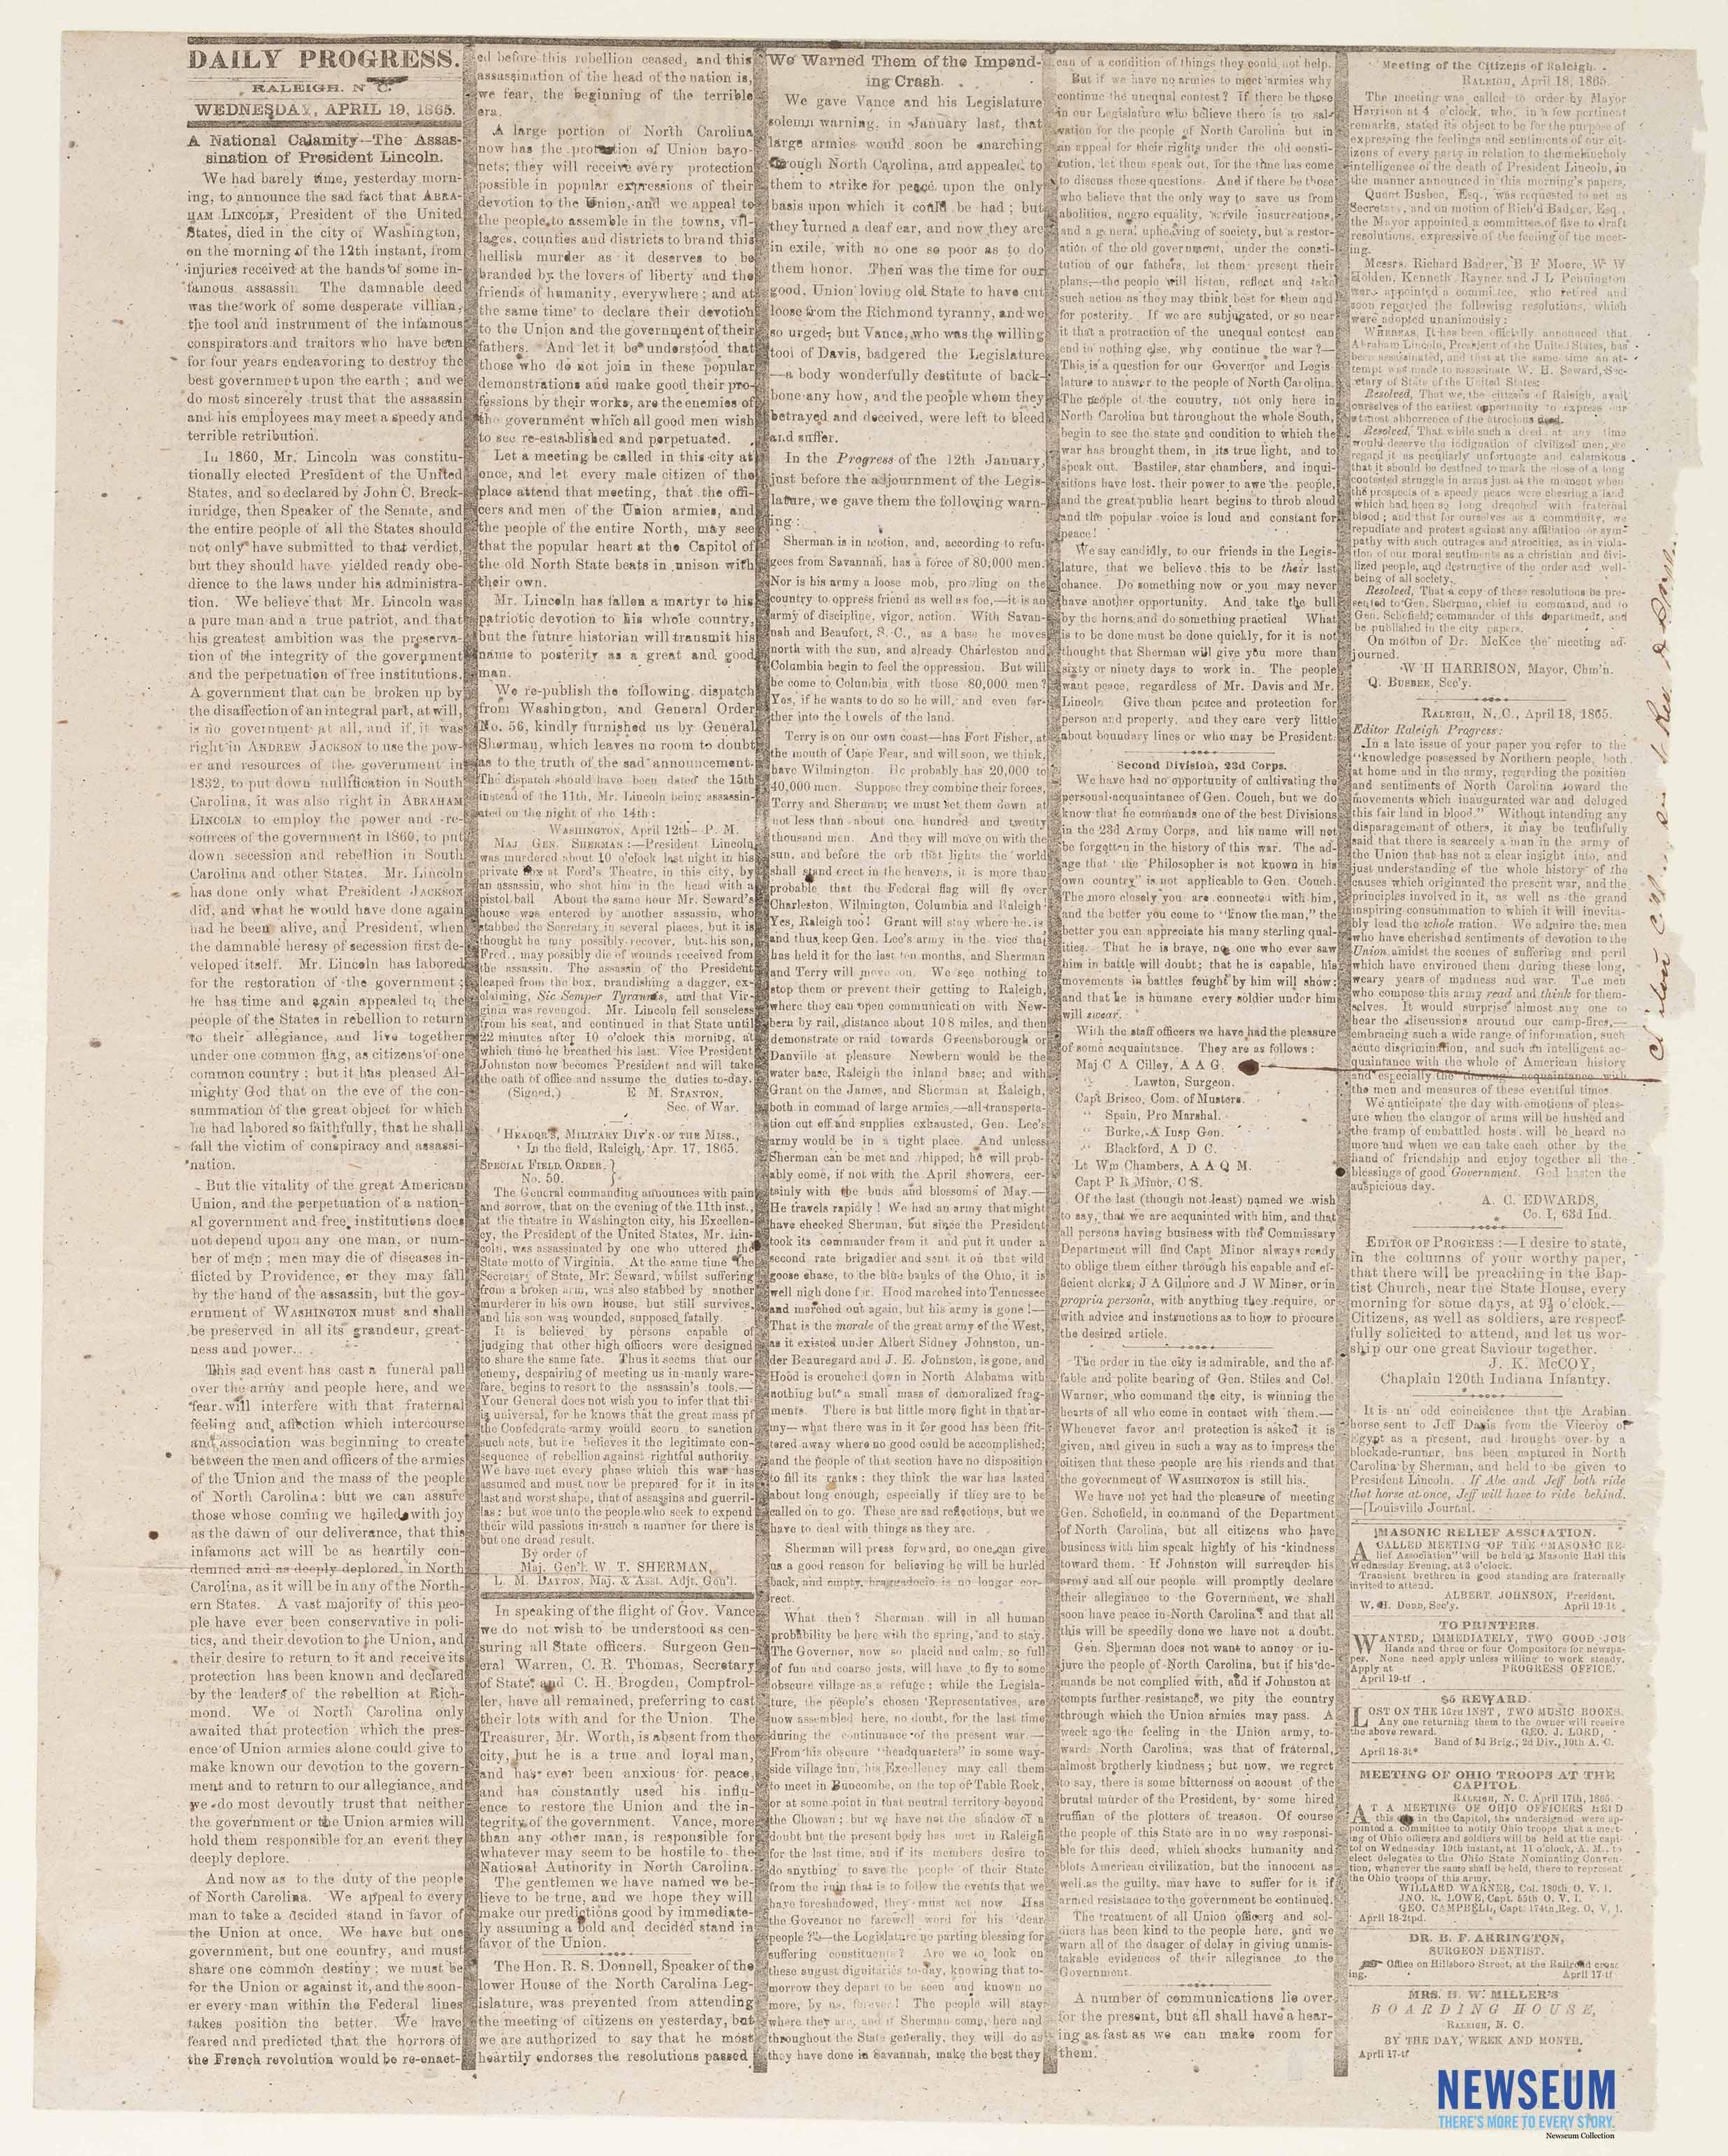 The Daily Progress, April 19, 1865